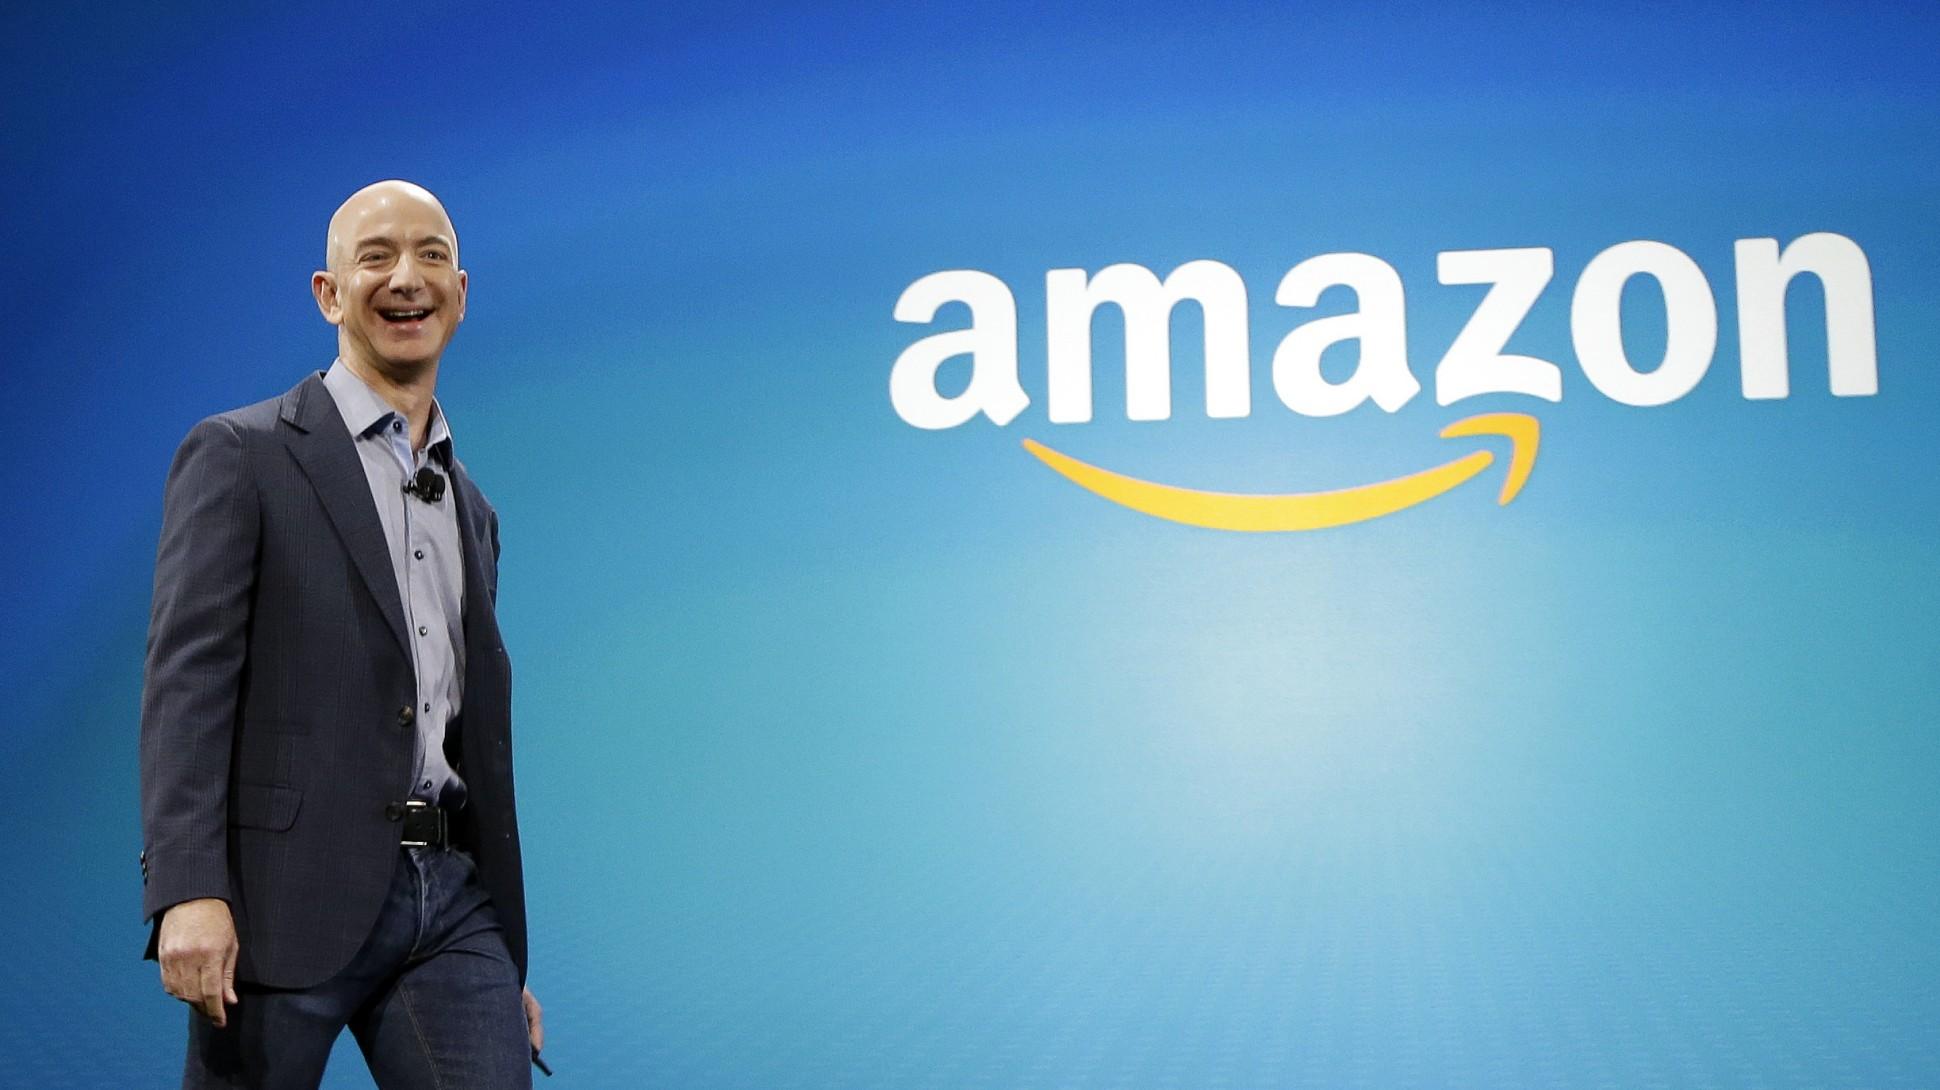 Bezos Amazon CEO marketing ecommerce